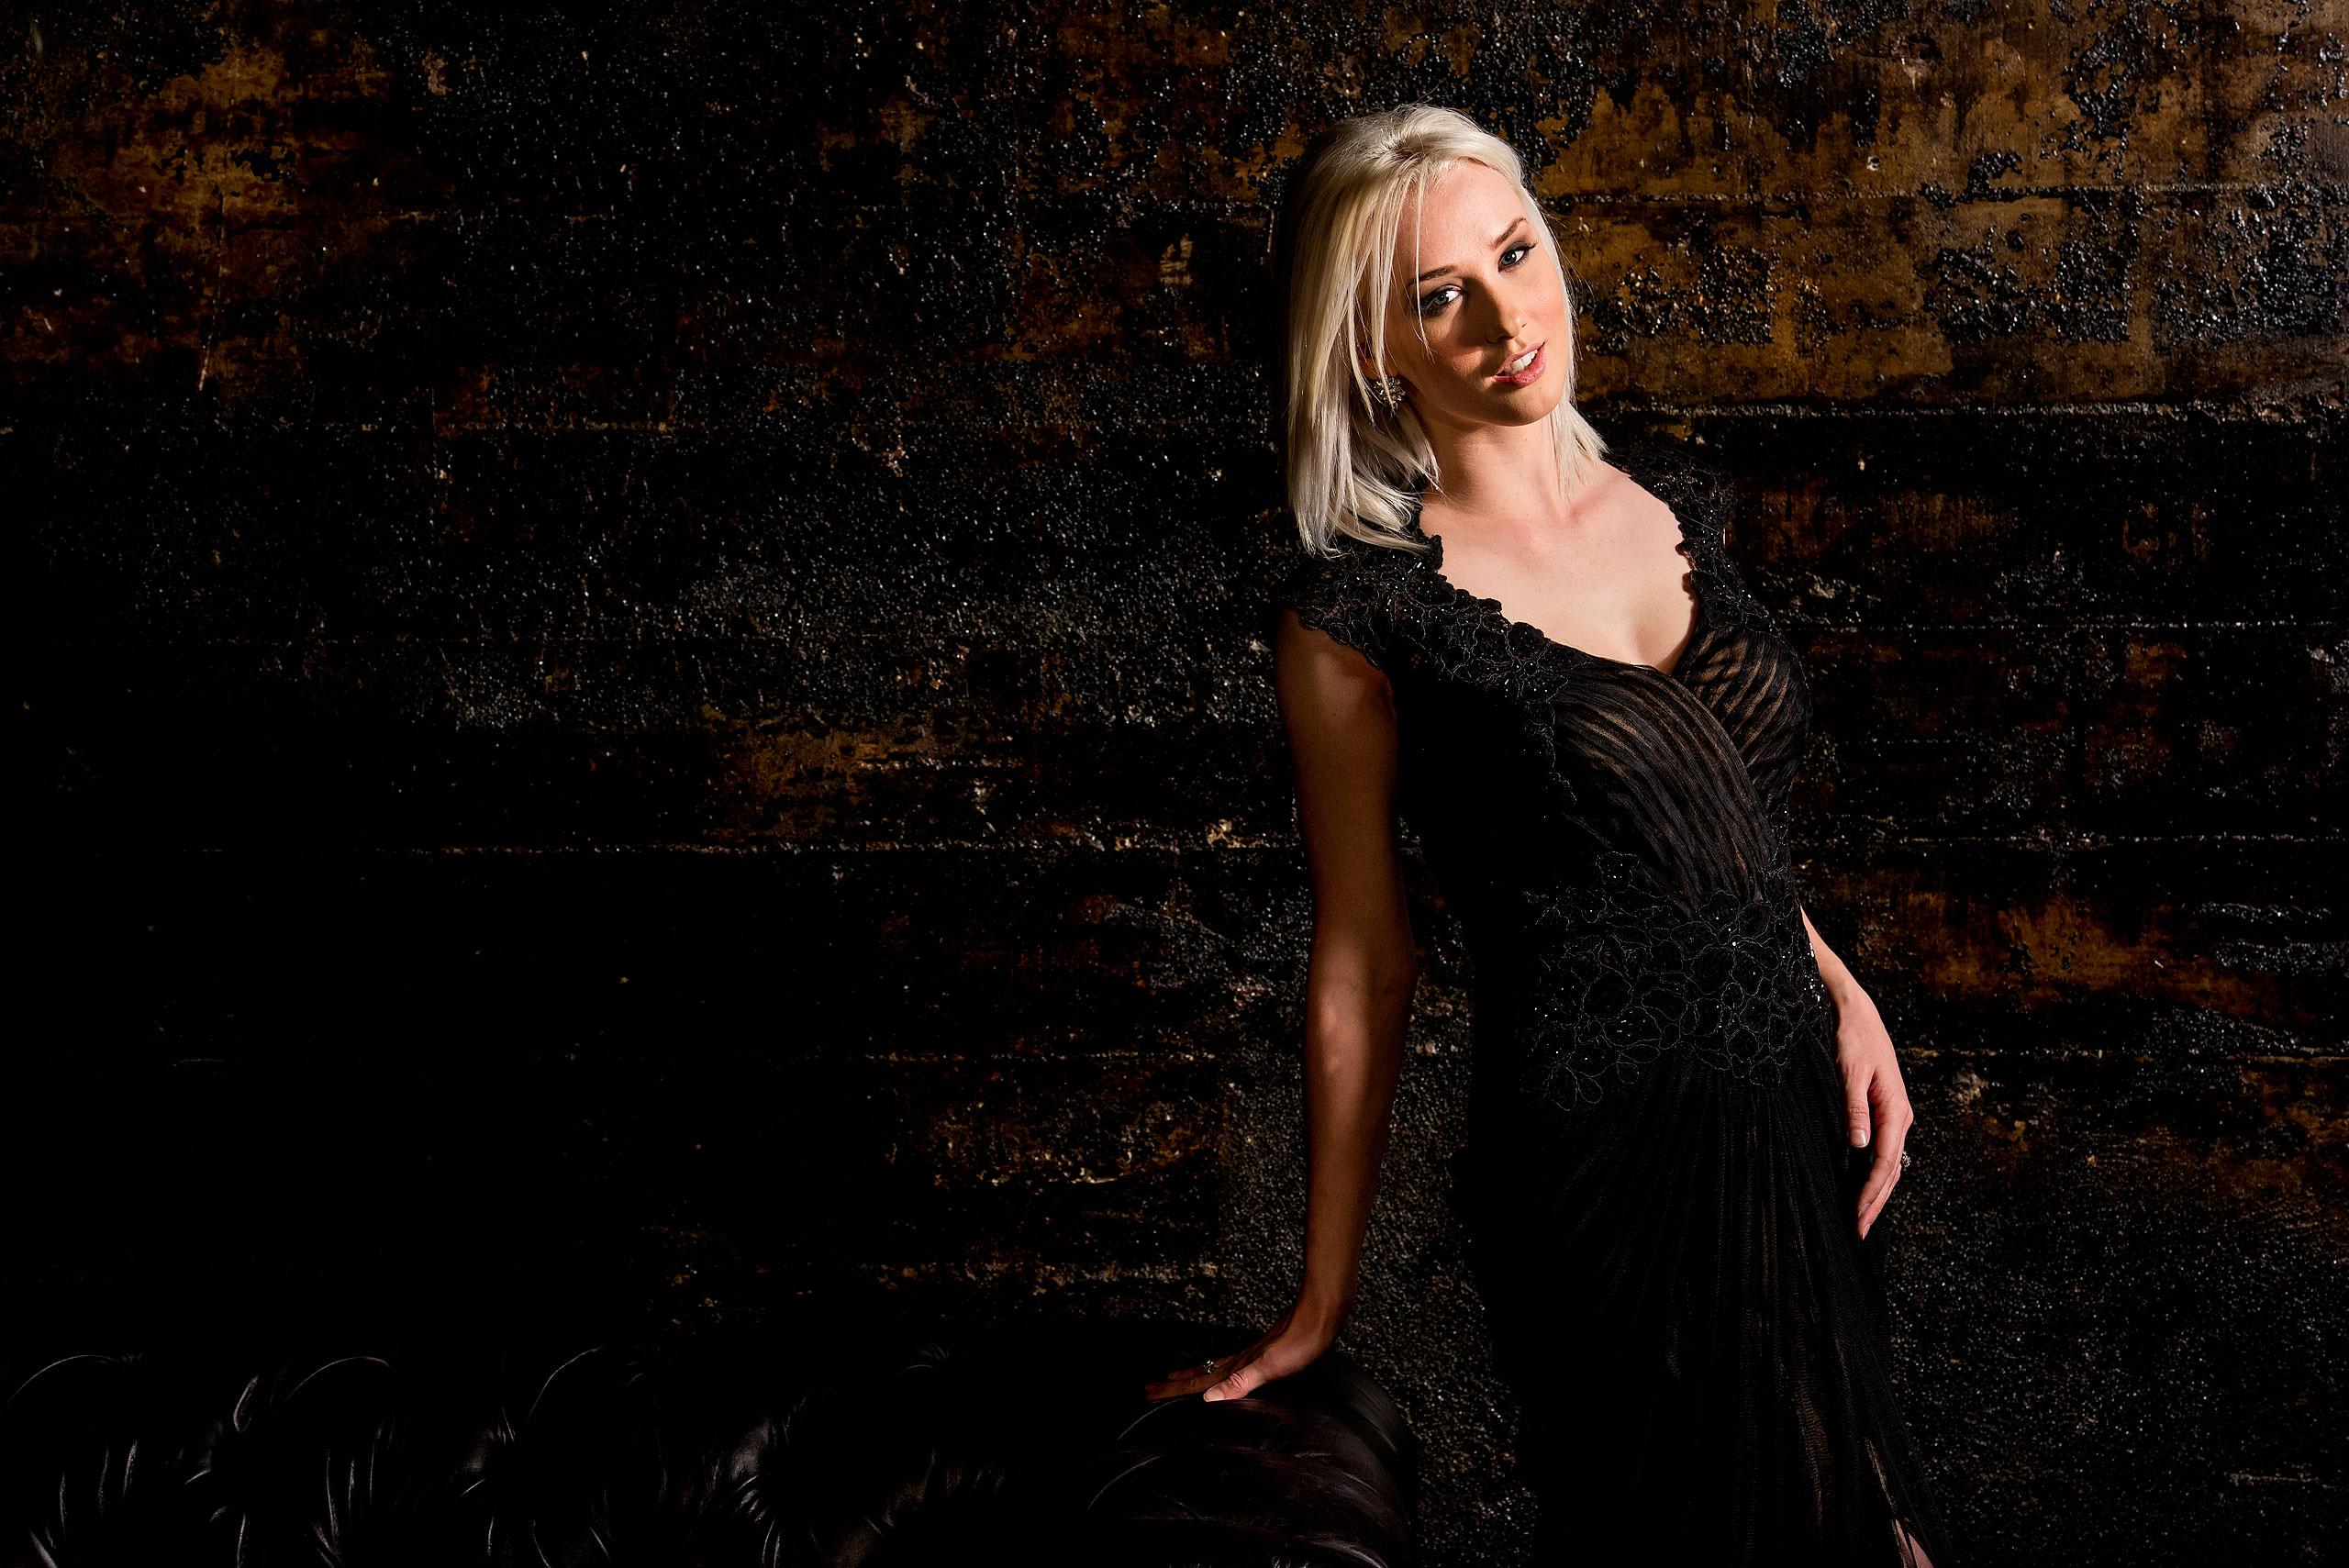 a model wearing a black dress leaning against a couch by calgary confetti fashion photographer sean leblanc